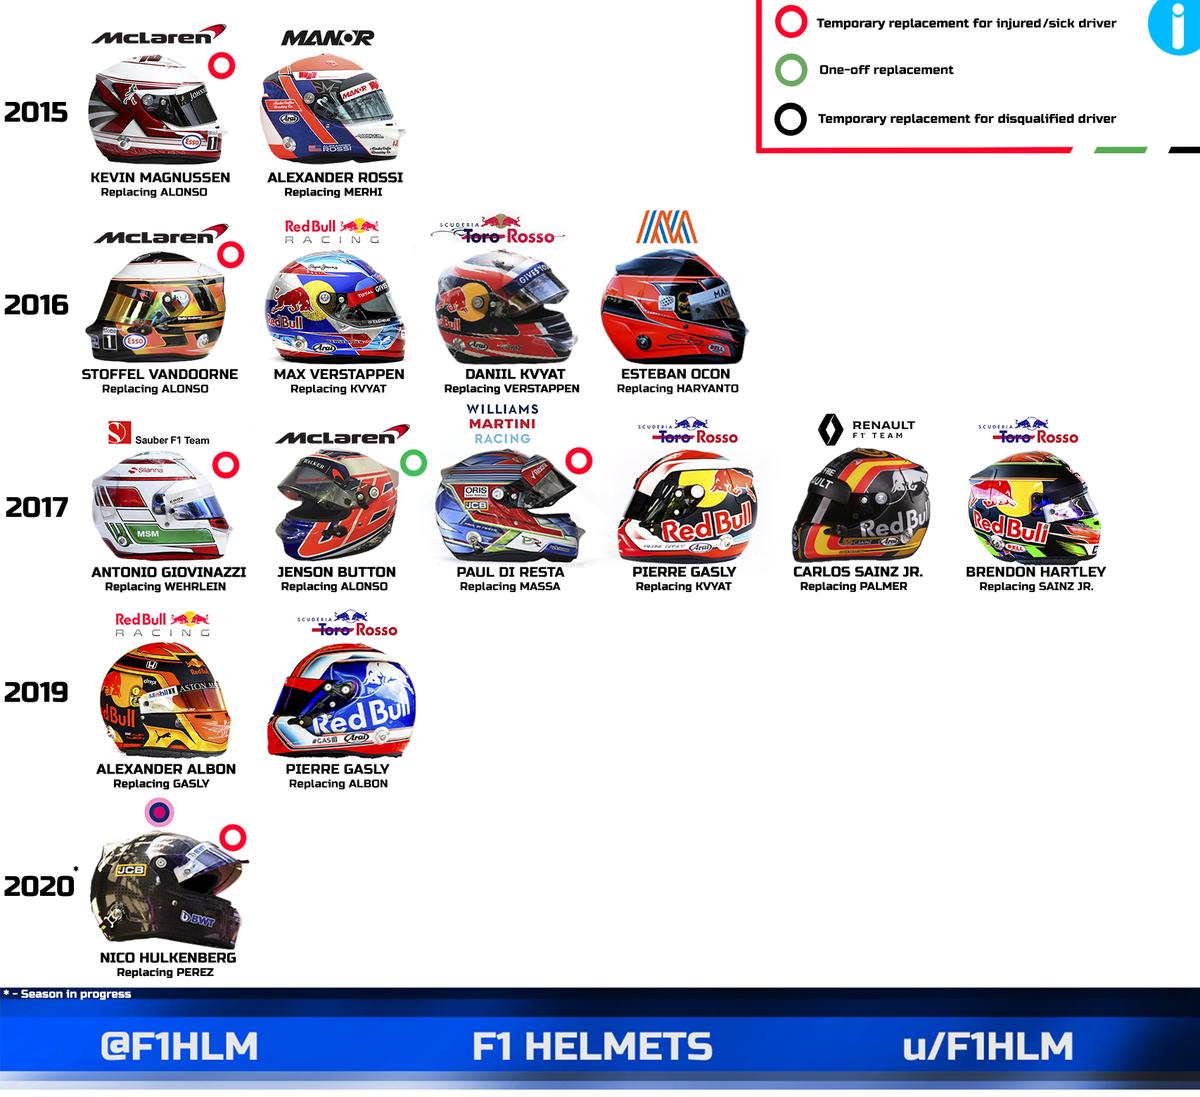 Replacement drivers since 2015 to this season  #hulkenback #F170 #f1 #f12020 #KM20 #magnussen #rossi #SV2 #vandoorne #MV33 #verstappen #DK26 #kvyat #EO31 #ocon #AG99 #giovinazzi #JB22 #button #diresta #PG10 #gasly #CS55 #sainz #hartley #albon #AA23 #NH27 #hulkenberg https://t.co/USosu5U4pE